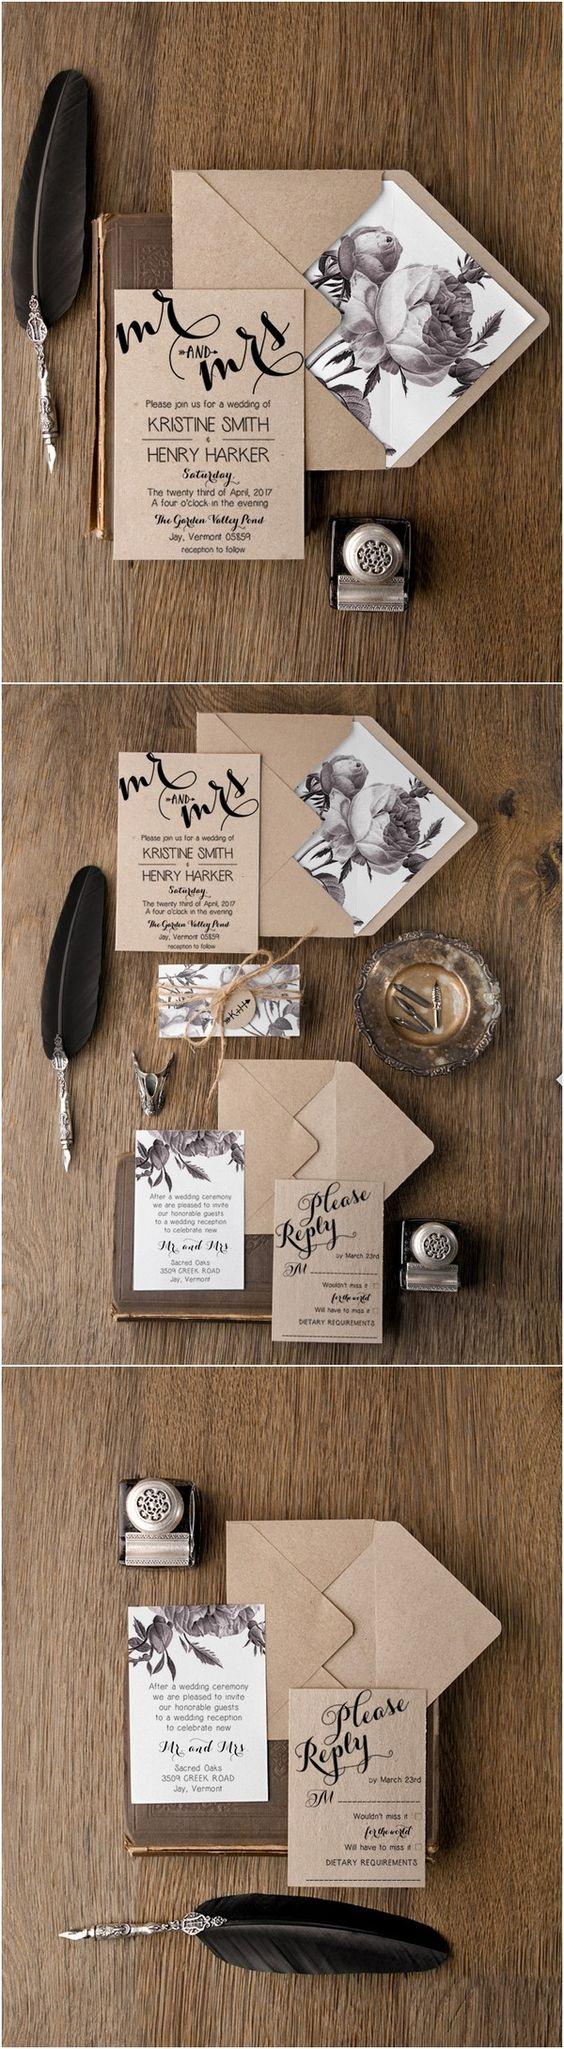 rustic wedding invitations wood wedding invitations Rustic simple wedding invitations